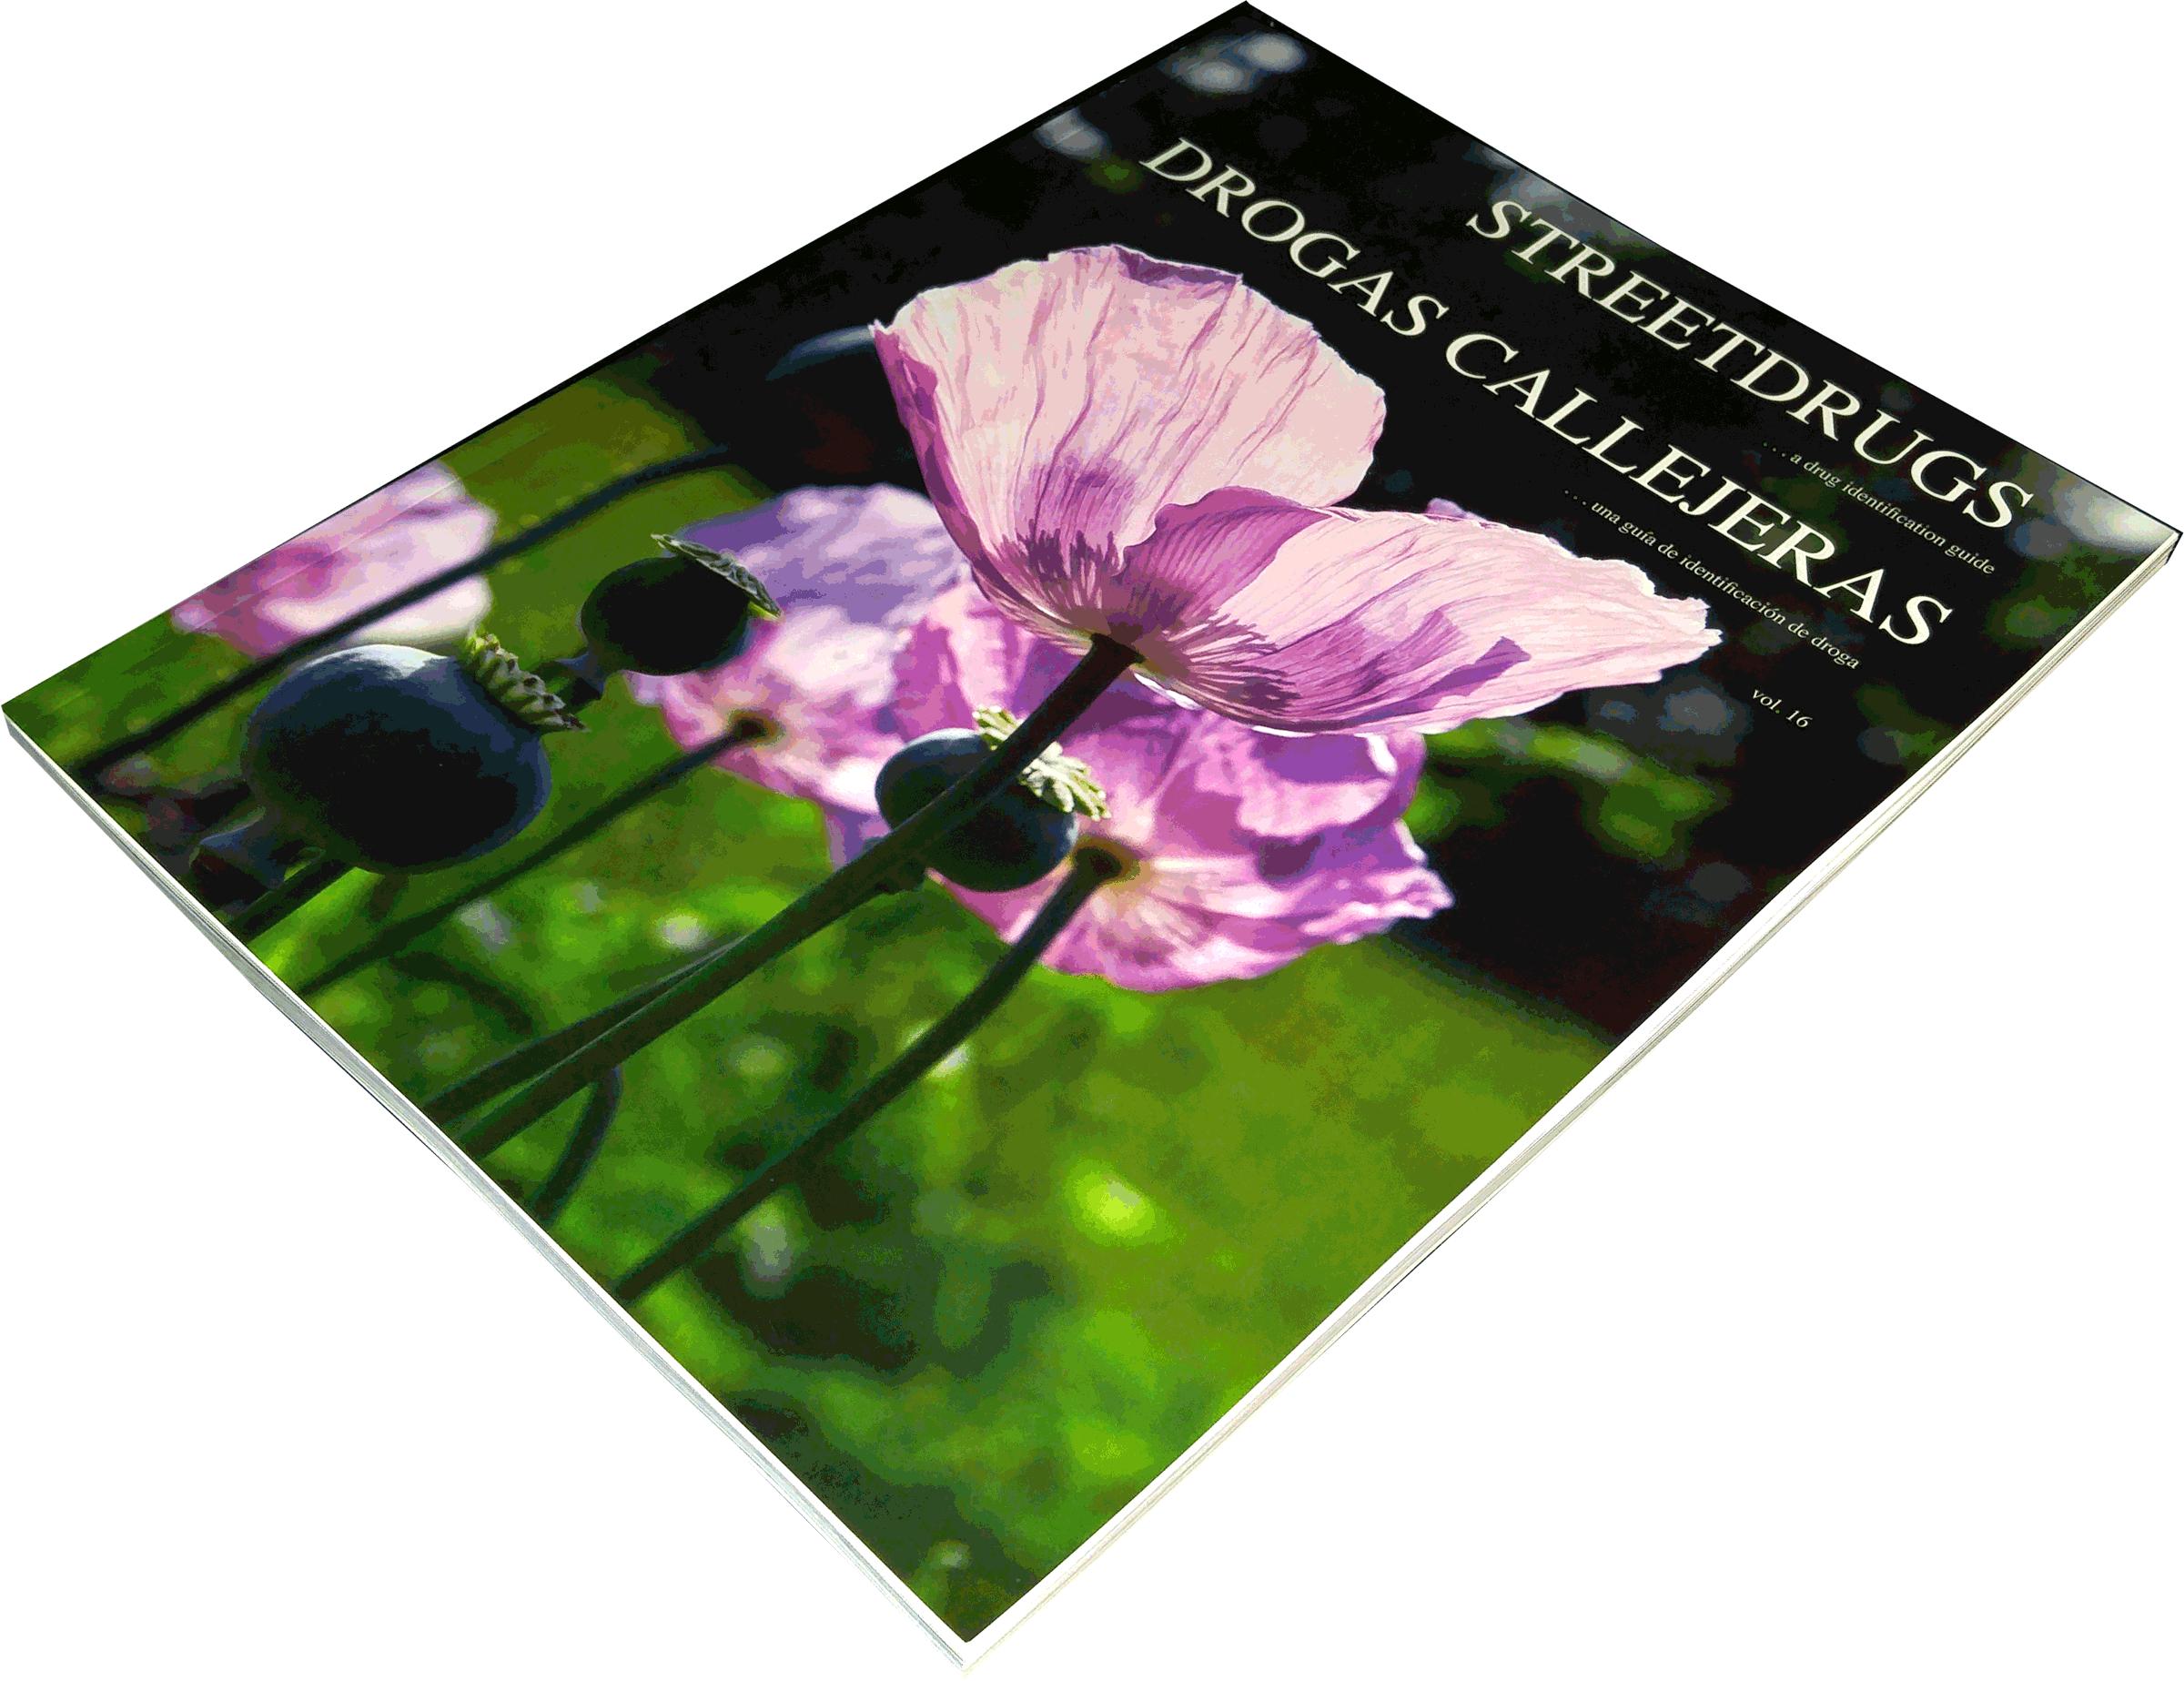 3000 Drug ID Guide English/Spanish (Print Version)